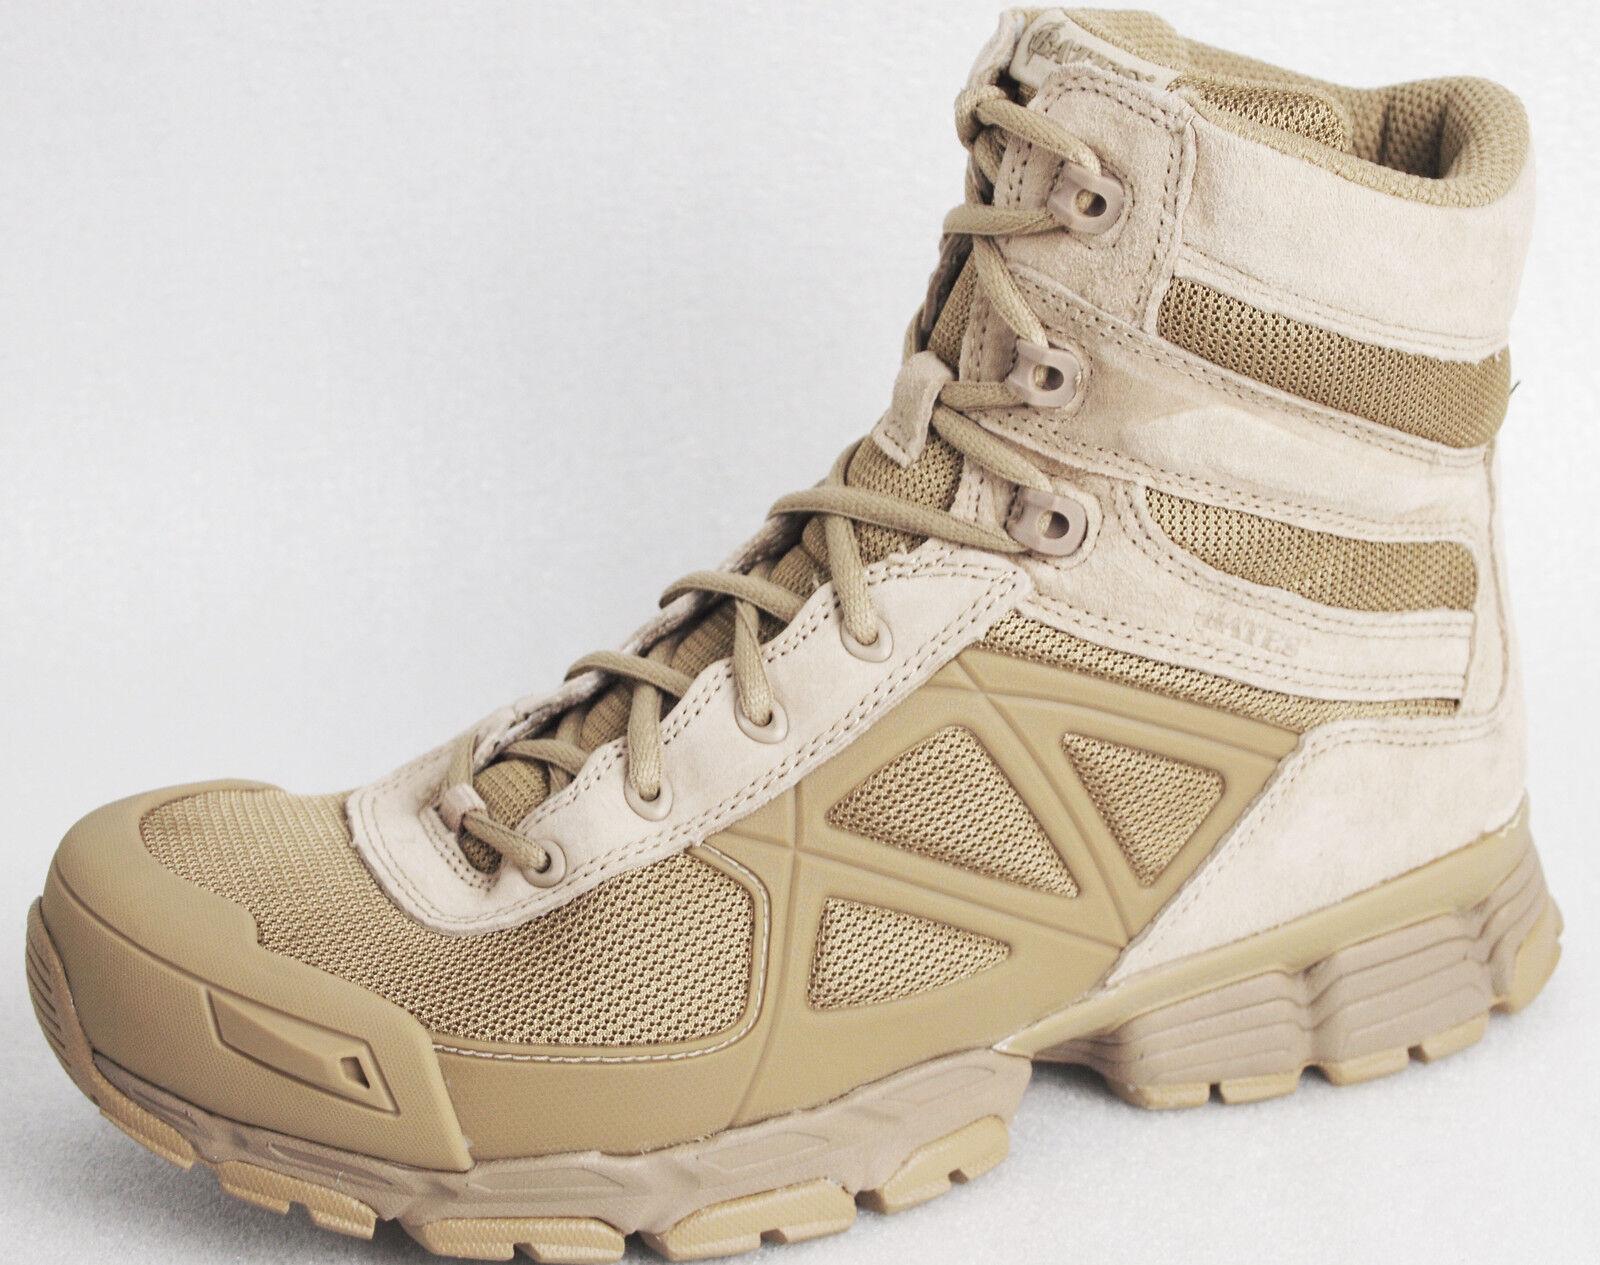 Bates Men's Velocitor Desert Tactical/Police/ Swat Boots